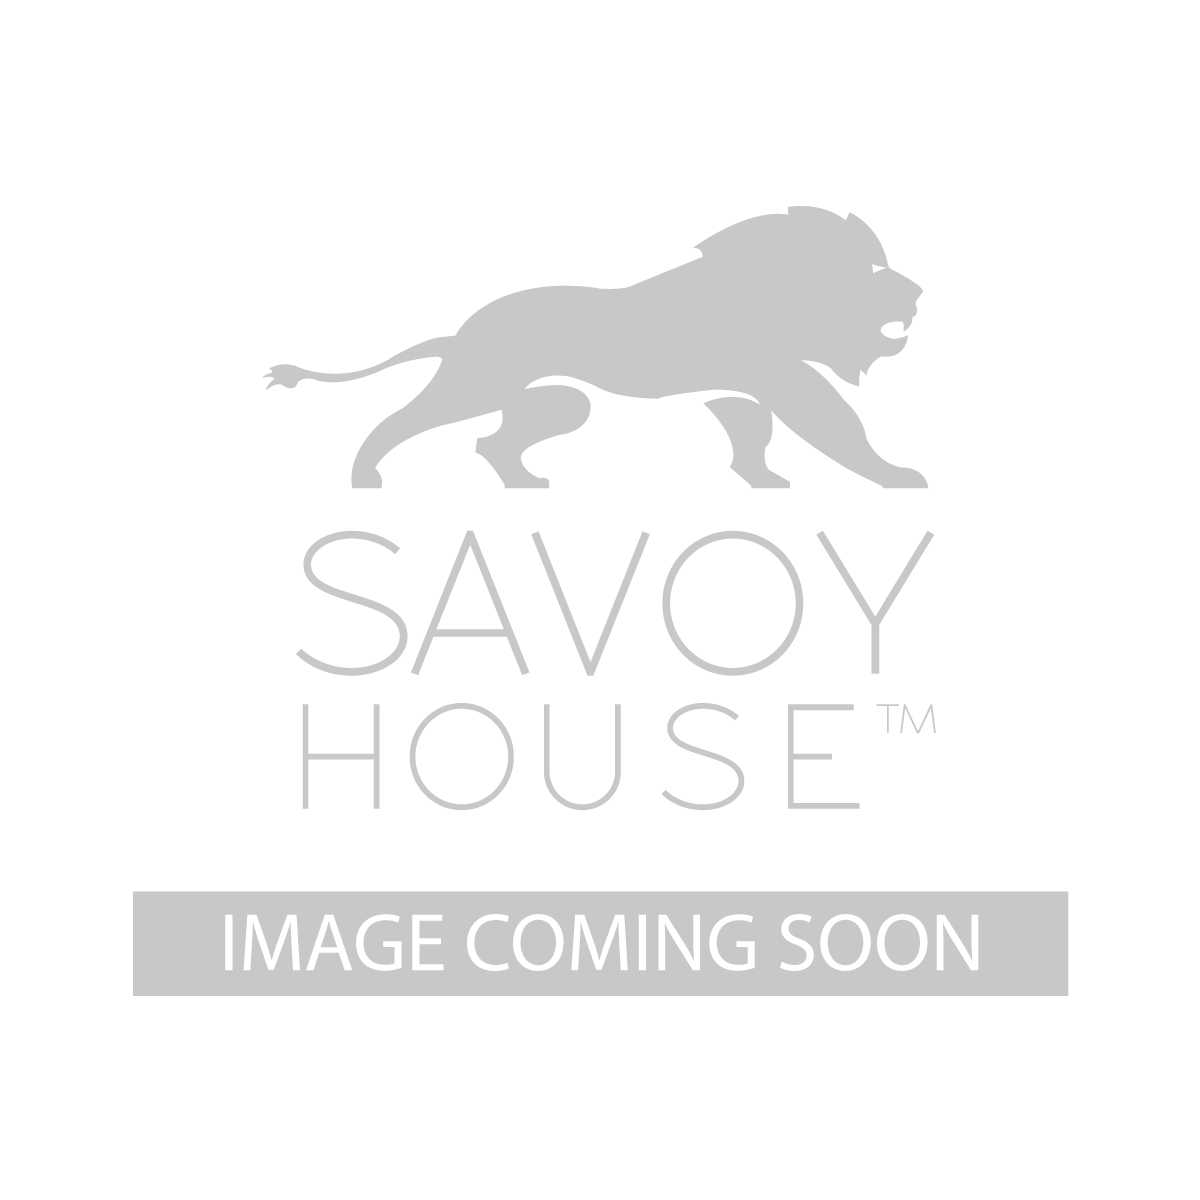 Bangle 5 Light Pendant  sc 1 st  Savoy House & 7-4702-6-11 Bangle 5 Light Pendant by Savoy House